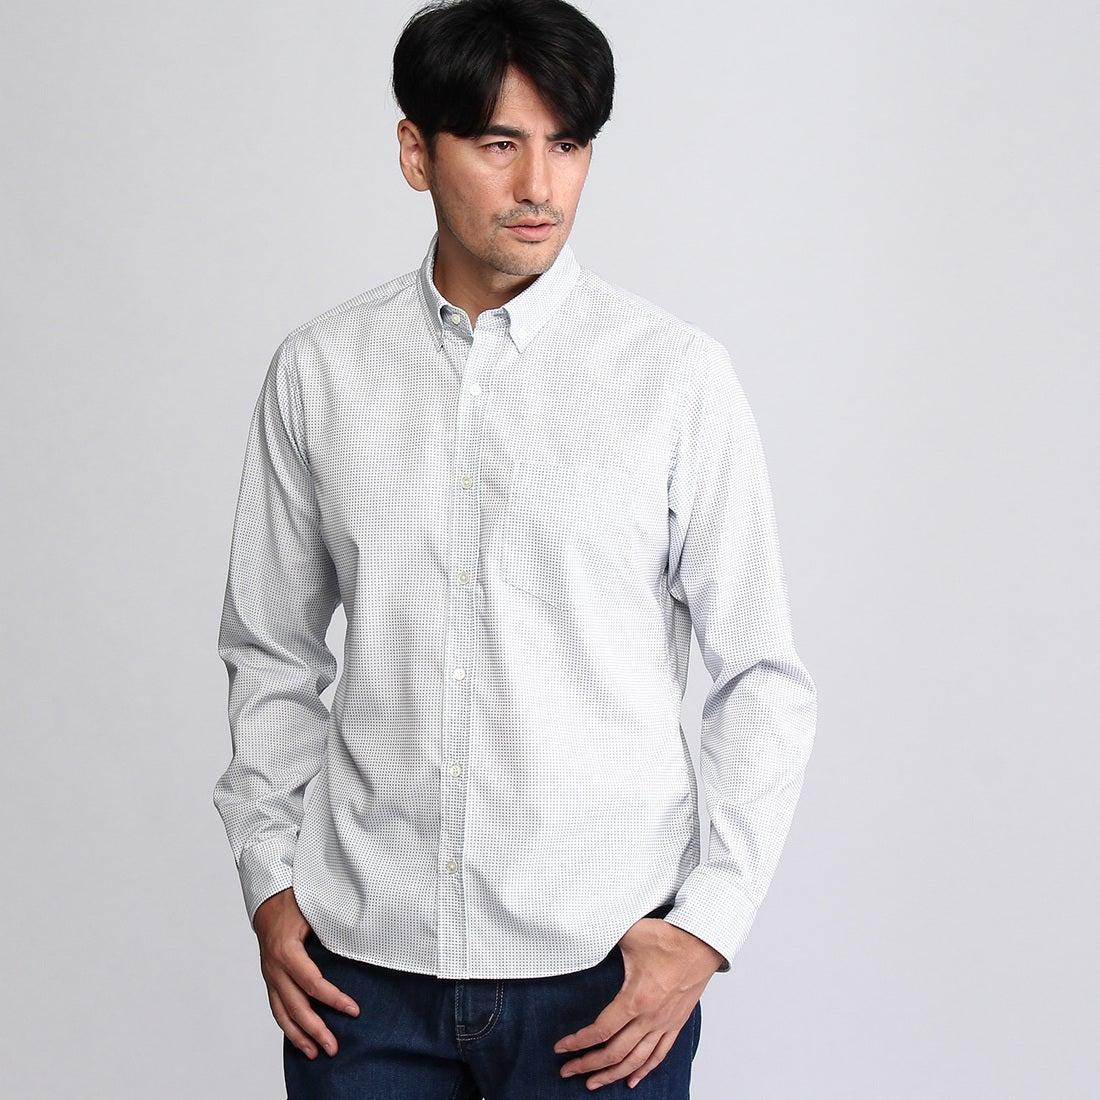 【SALE 30%OFF】タケオ キクチ TAKEO KIKUCHI 【ON/OFF】刺し子ドットシャツ (ライトブルー)